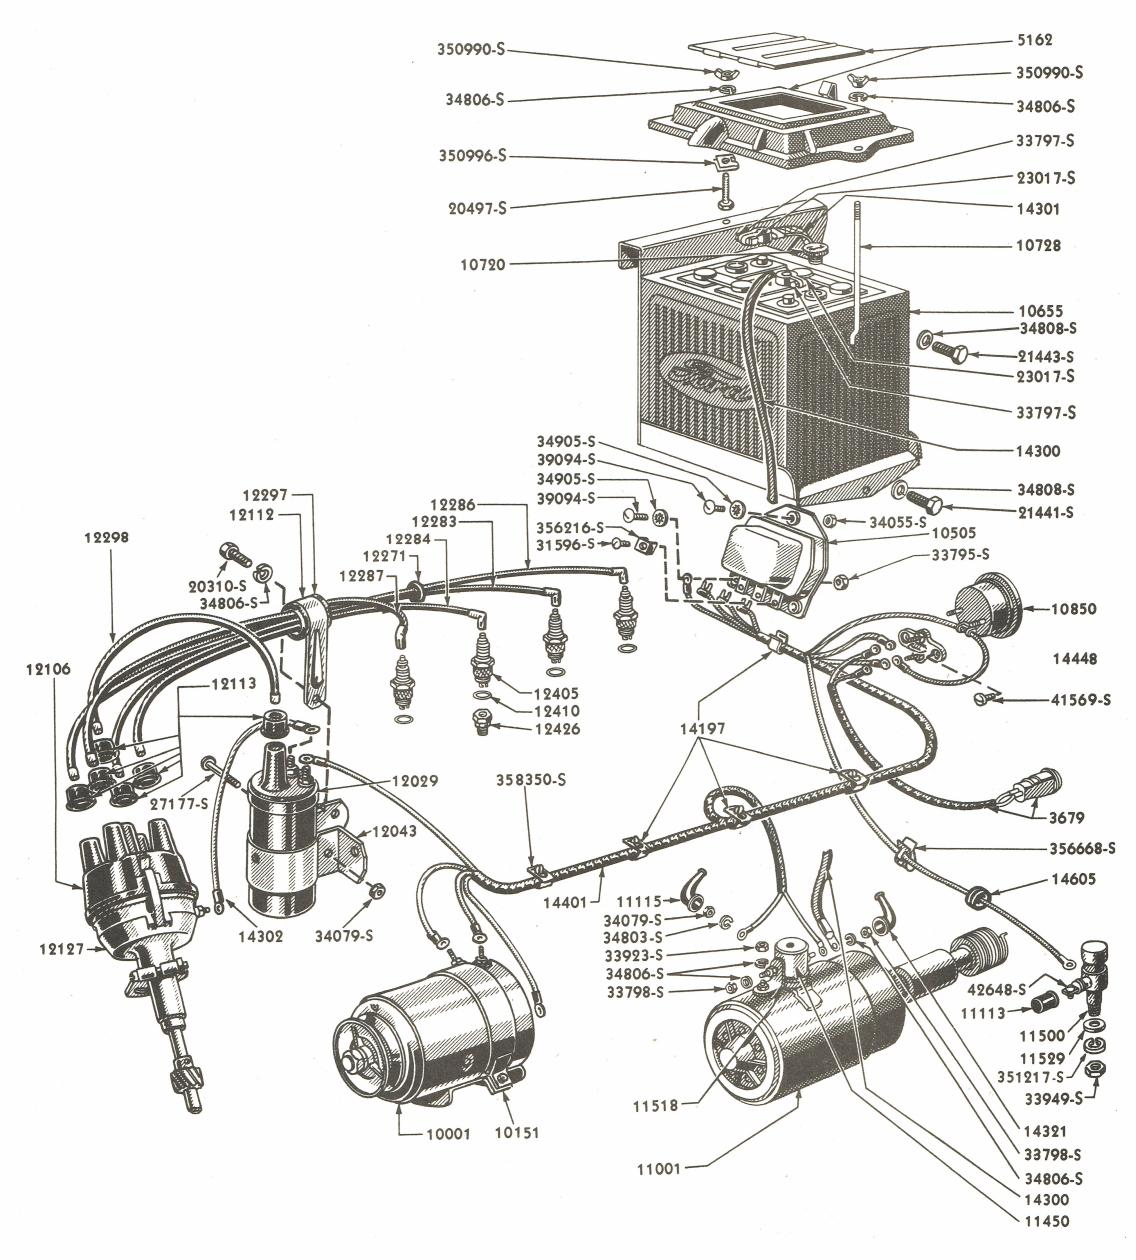 8N Tractor Wiring - Wiring Diagram Data - 9N Ford Tractor Wiring Diagram